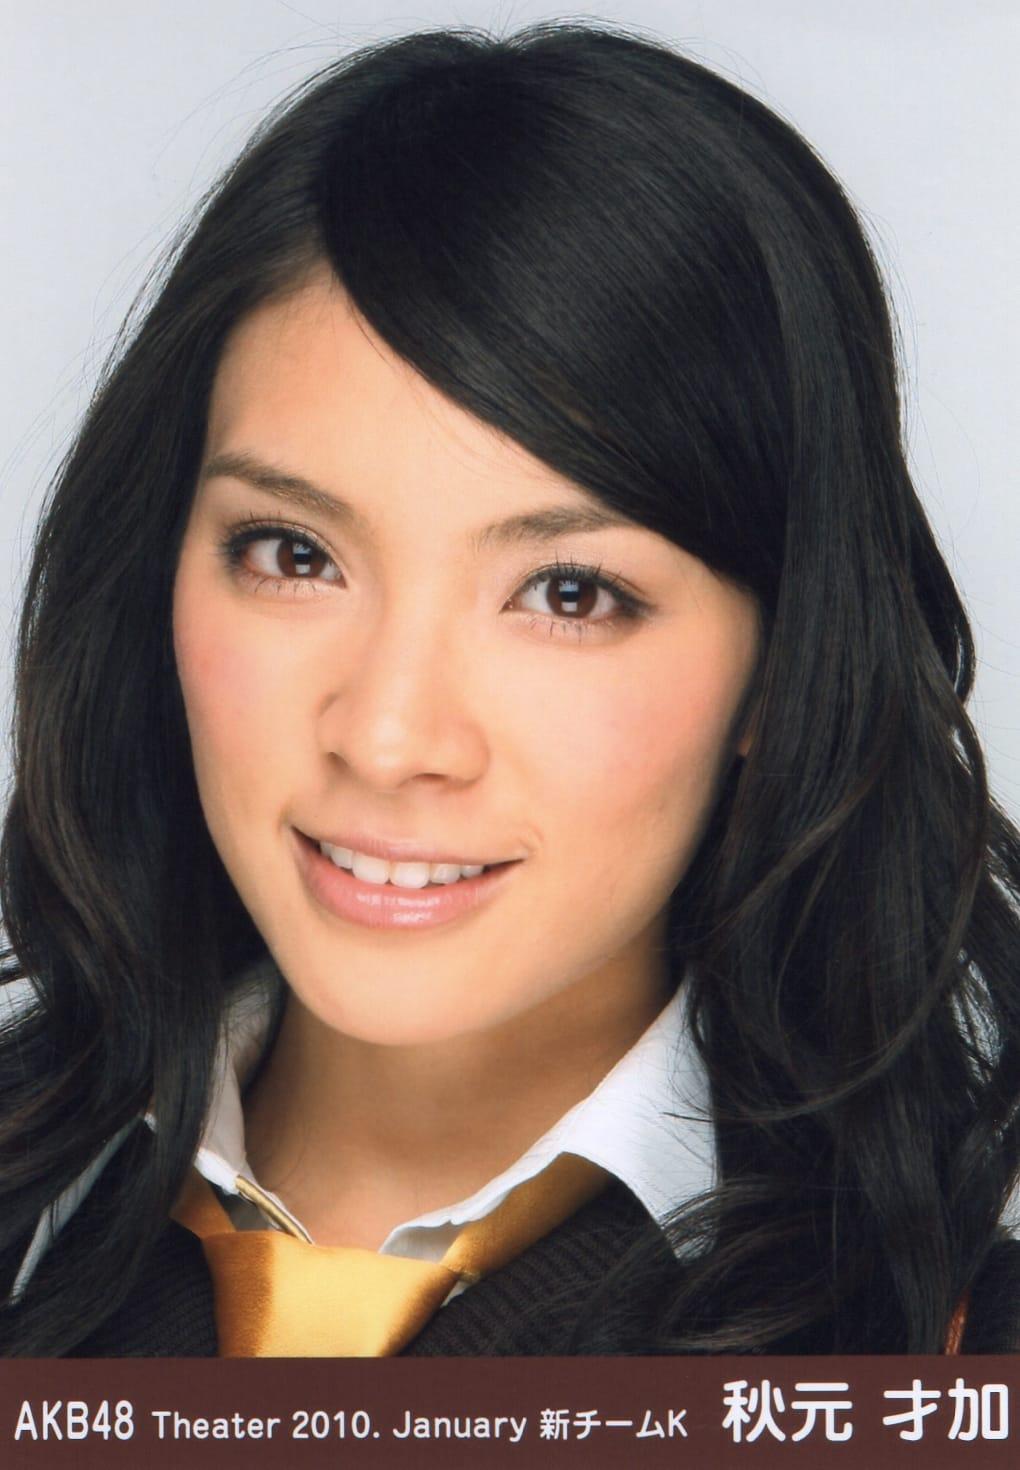 Picture of Sayaka Akimoto